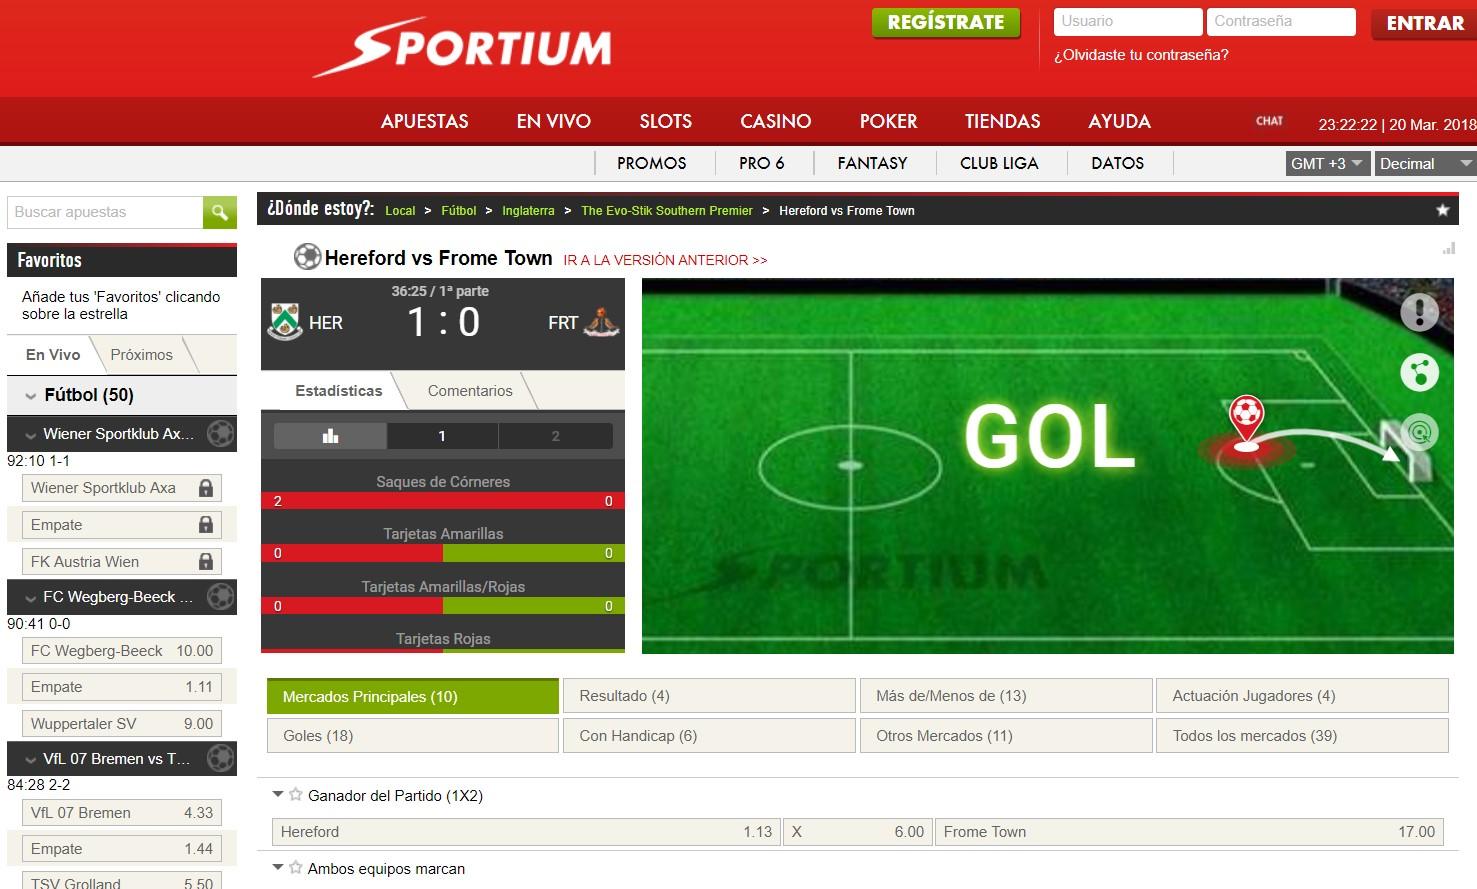 Sportium casino con - 86590